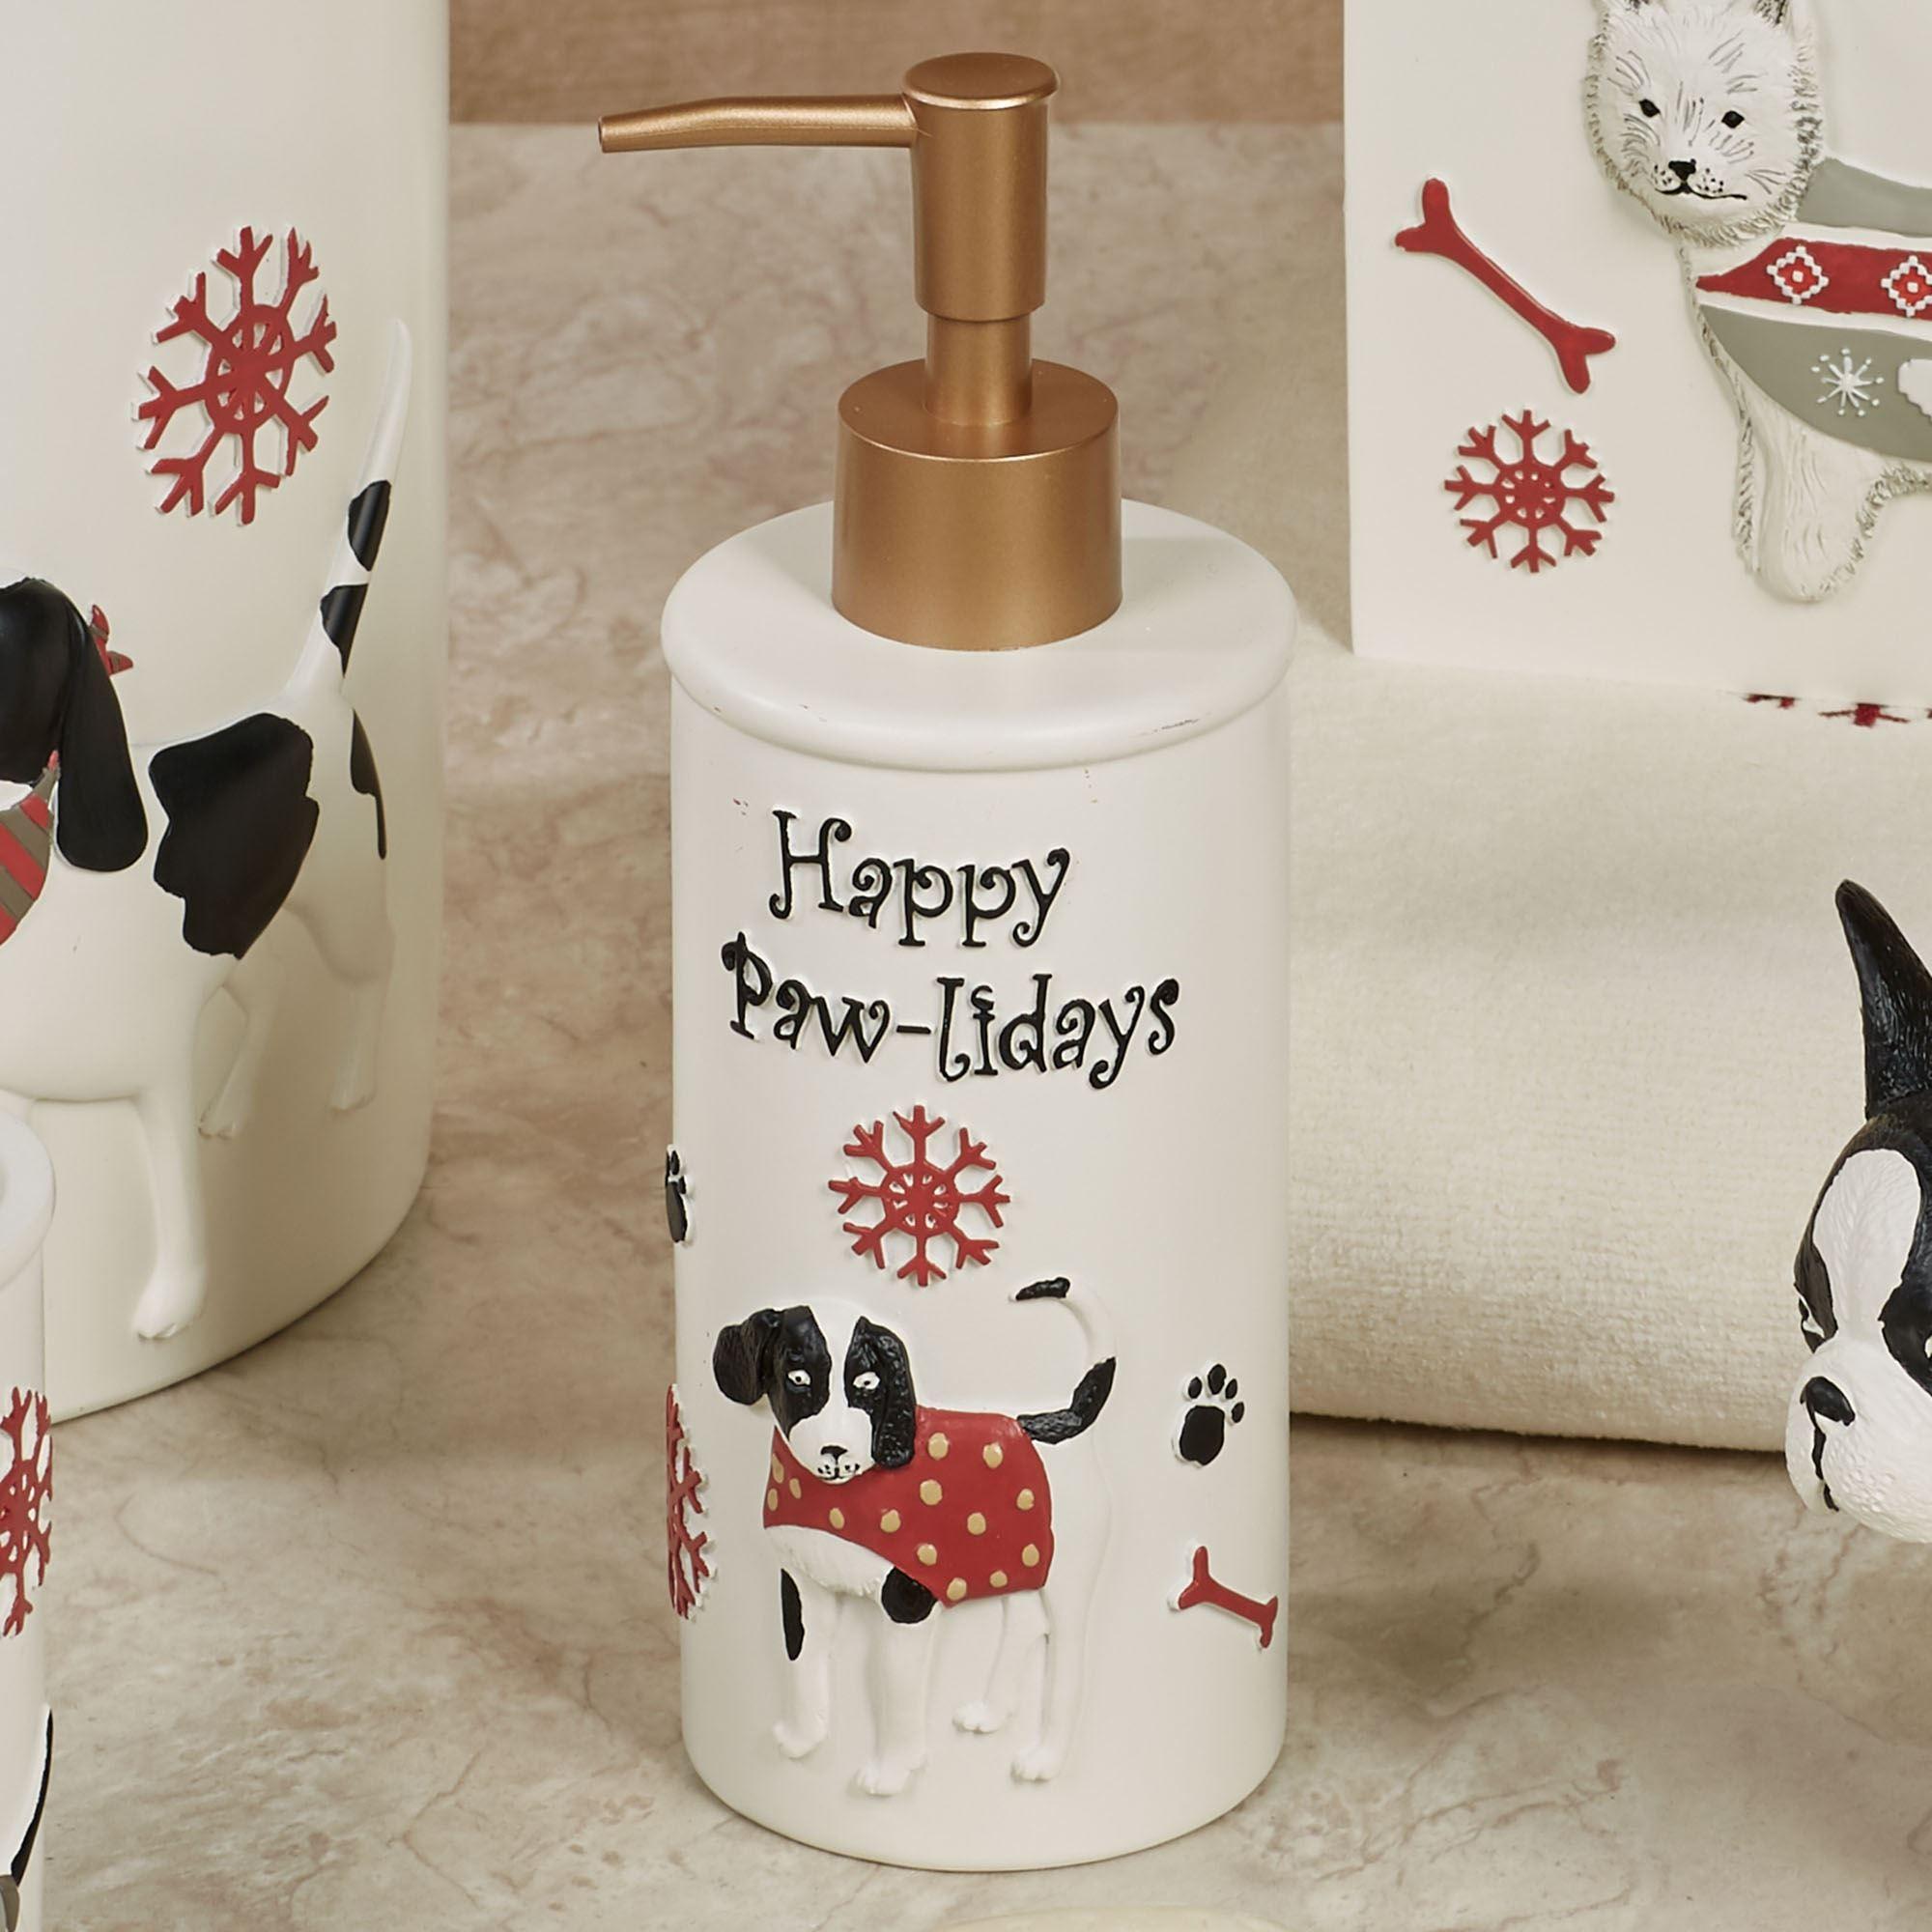 Hy Pawlidays Lotion Soap Dispenser Ivory